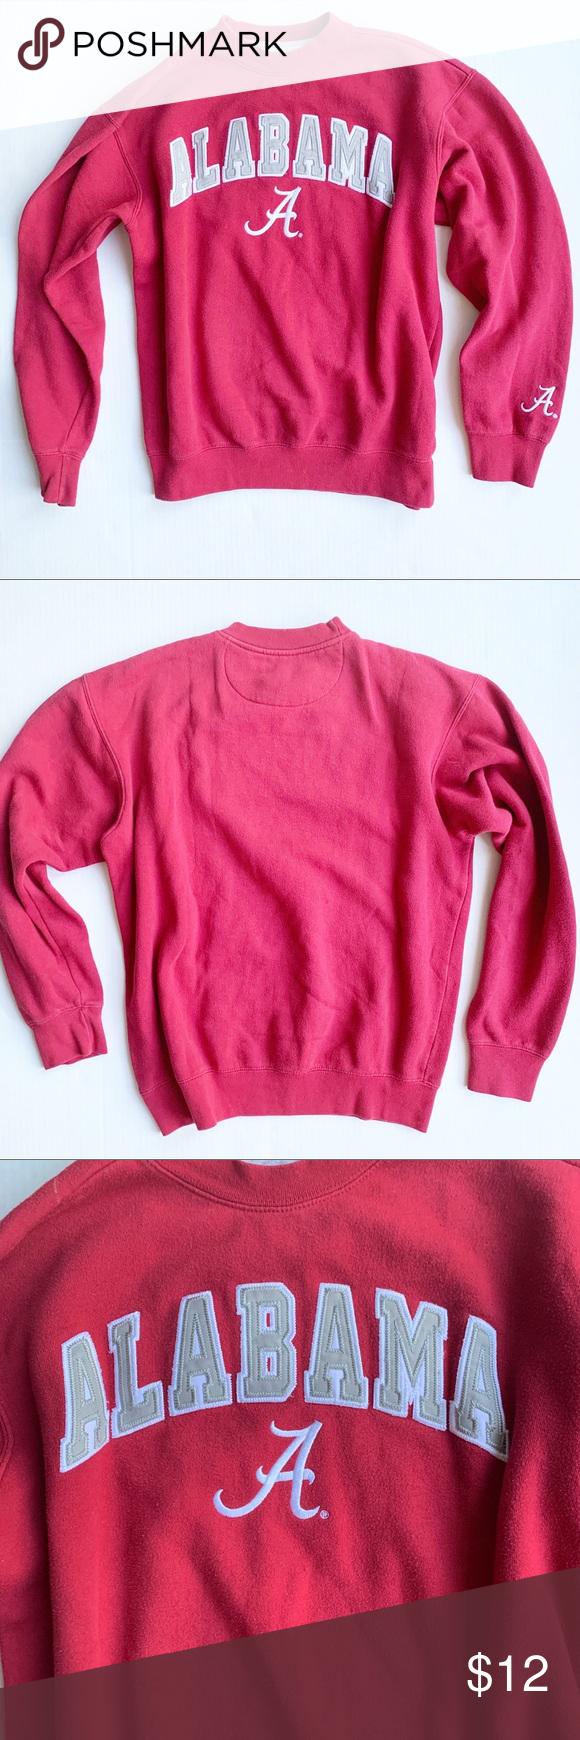 Alabama Crimson Tide Crewneck Sweatshirt Sweatshirts Crew Neck Sweatshirt Male Sweaters [ 1740 x 580 Pixel ]